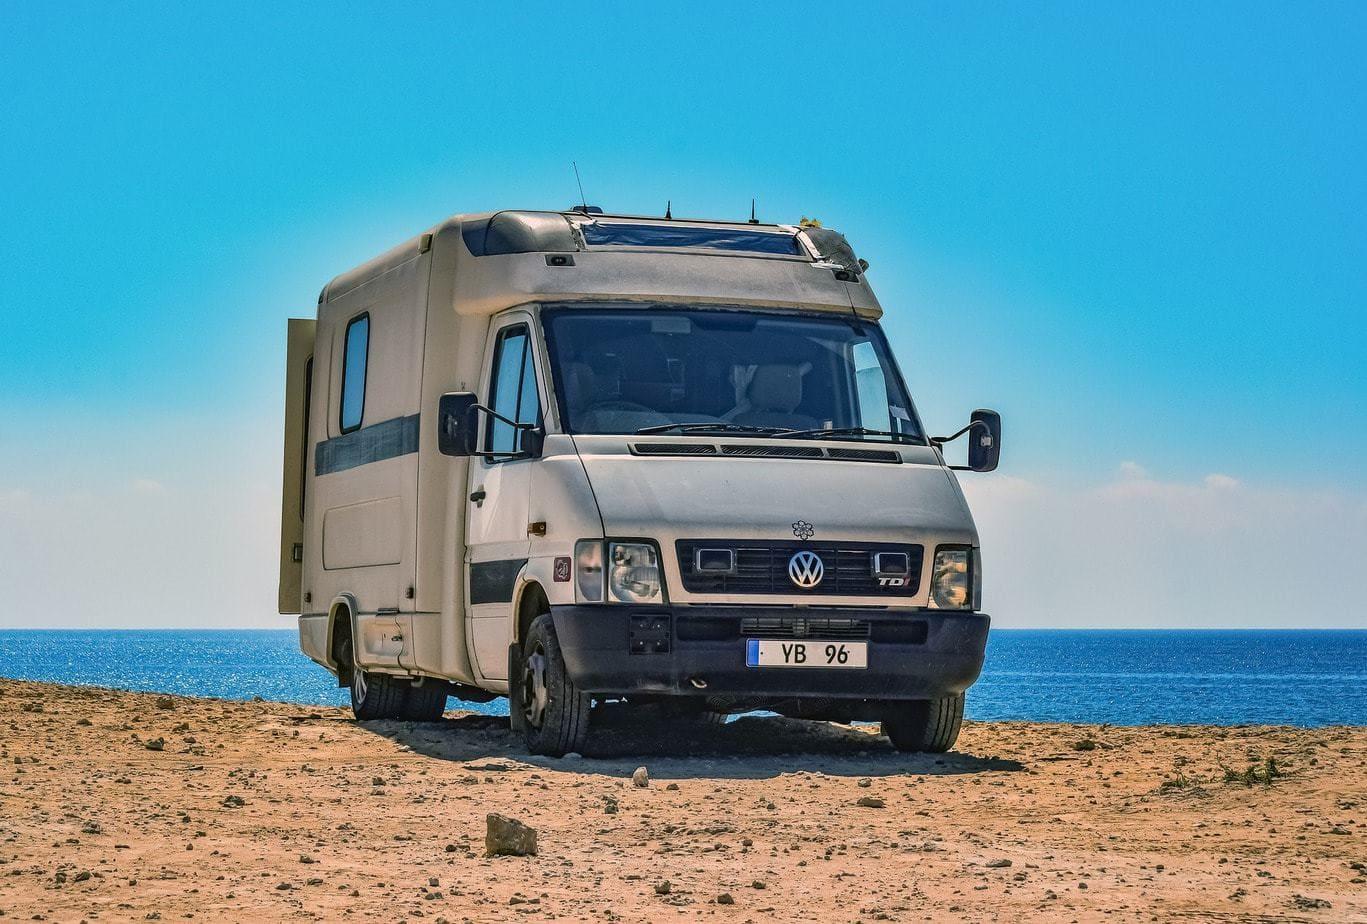 Volkswagen RV motorhome at California Beach